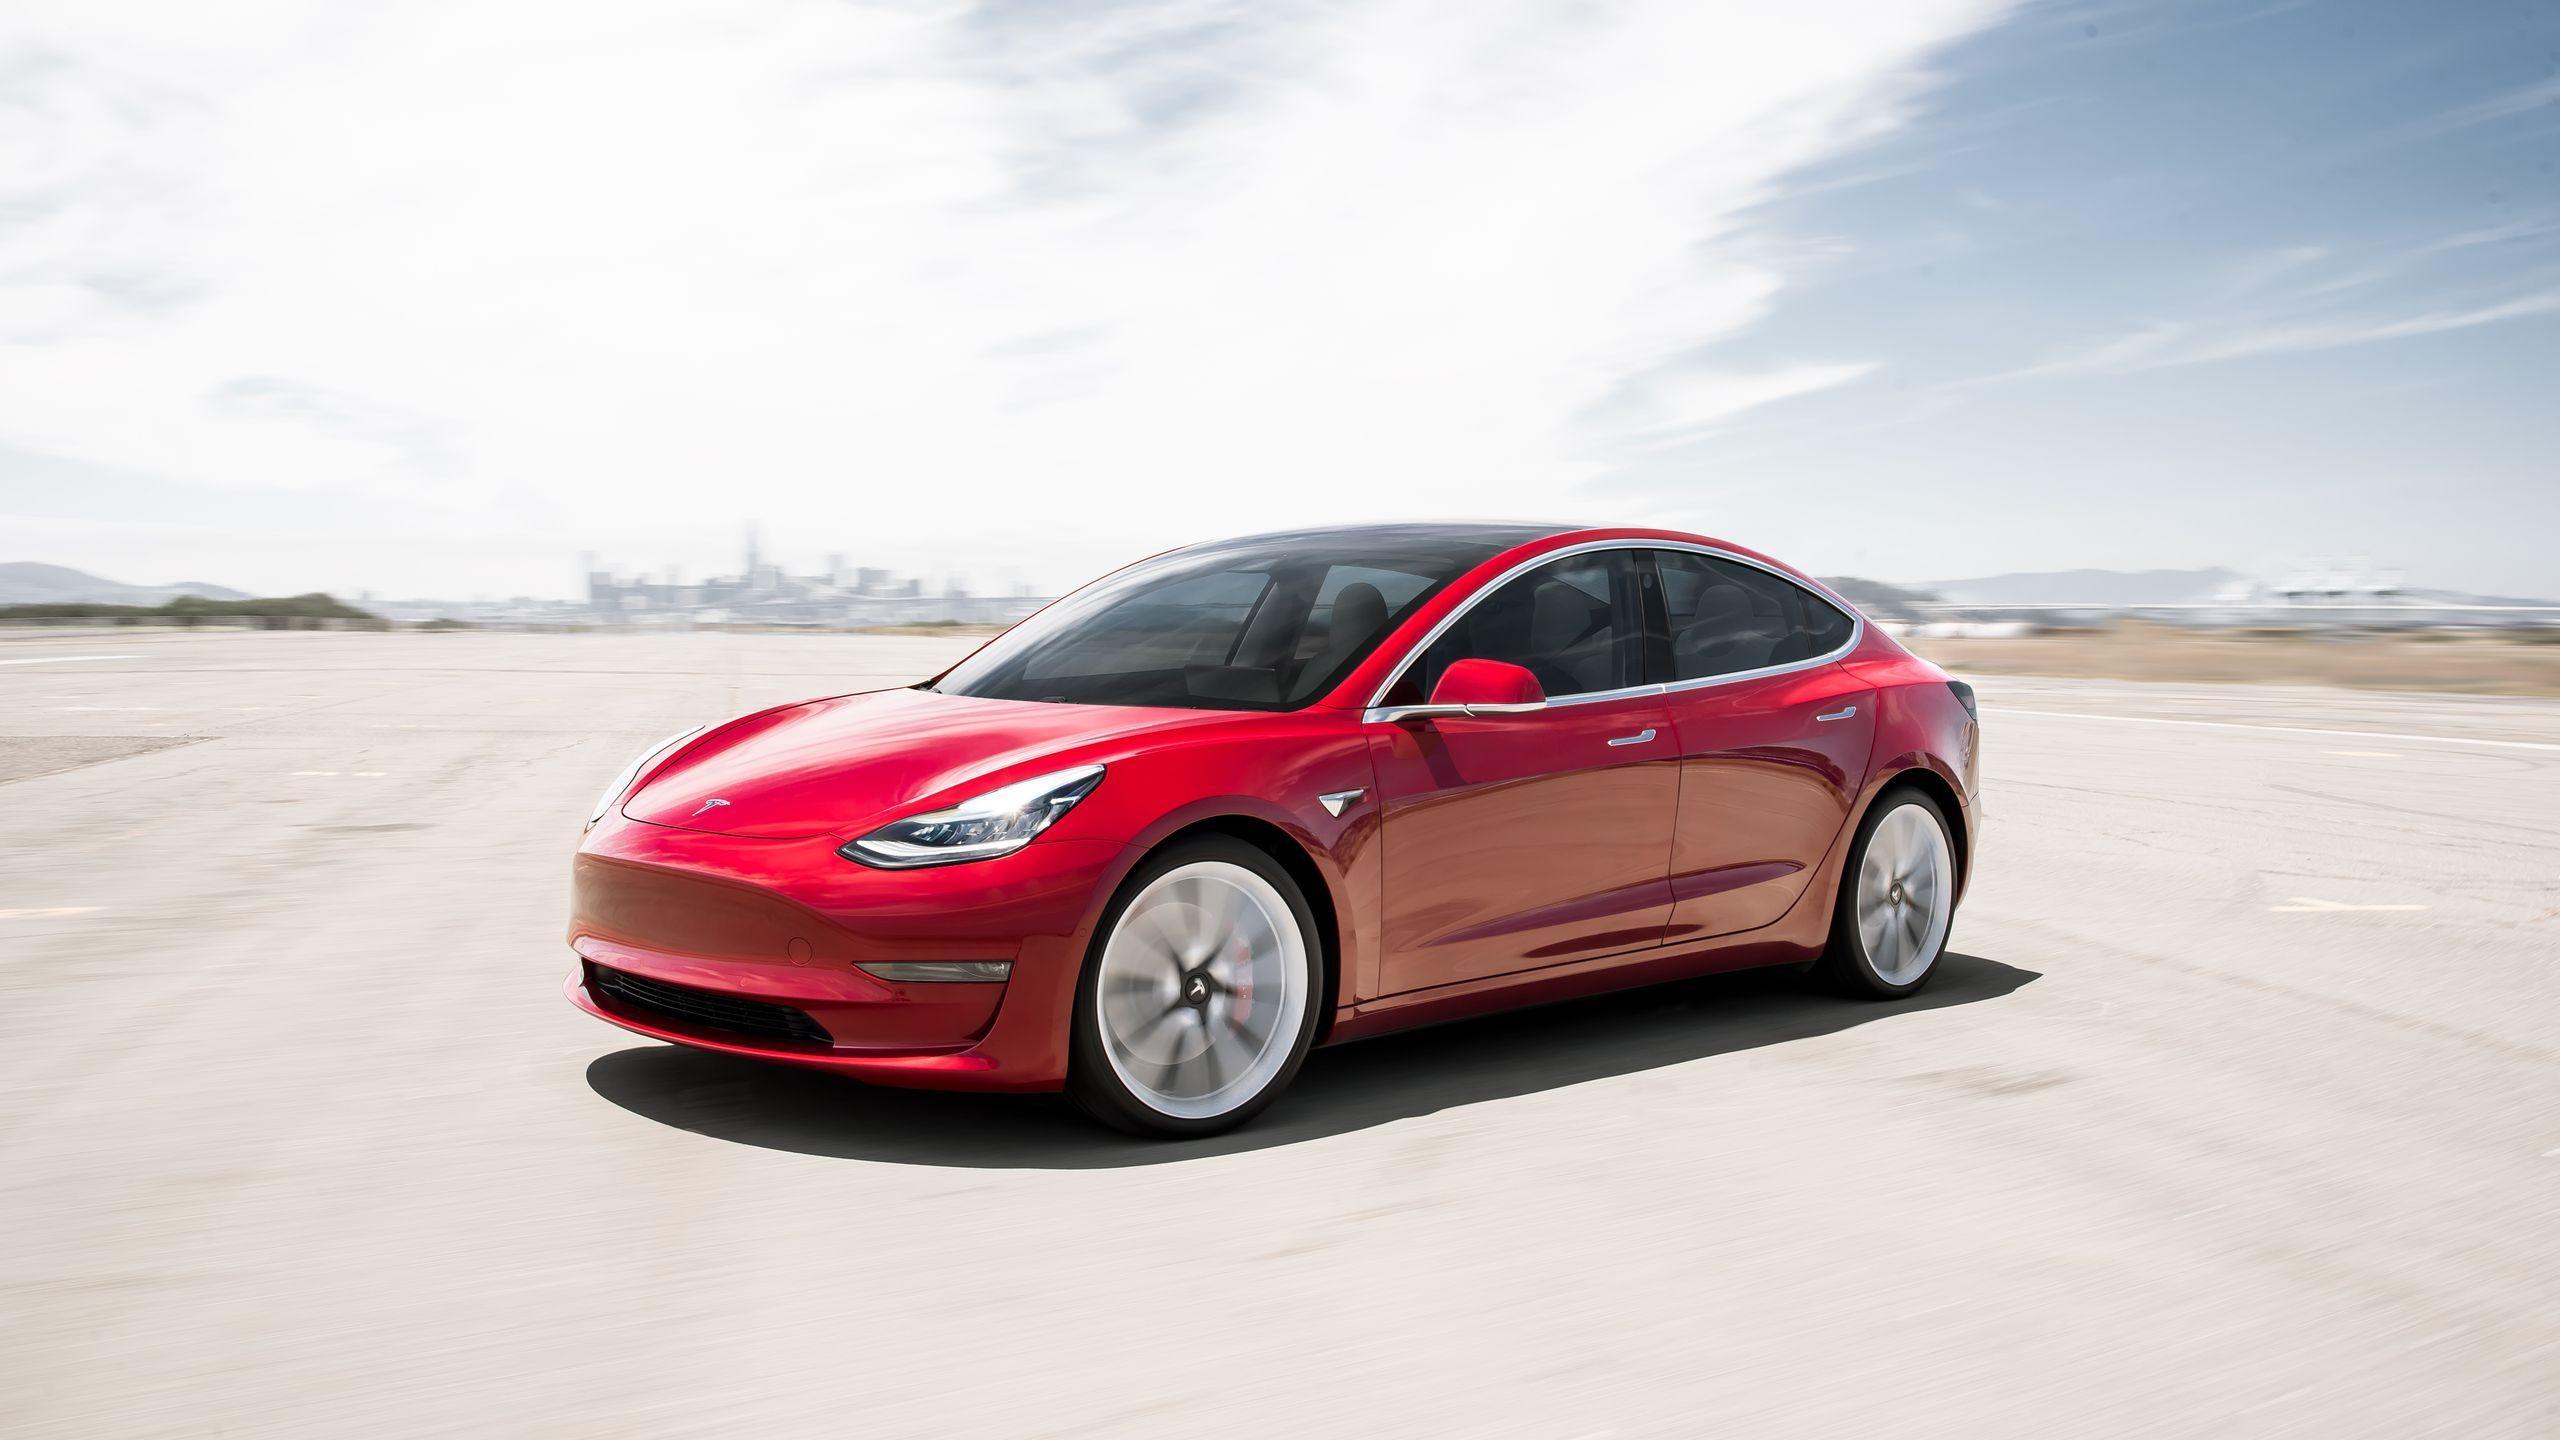 Tesla Model 3 Wallpapers Top Free Tesla Model 3